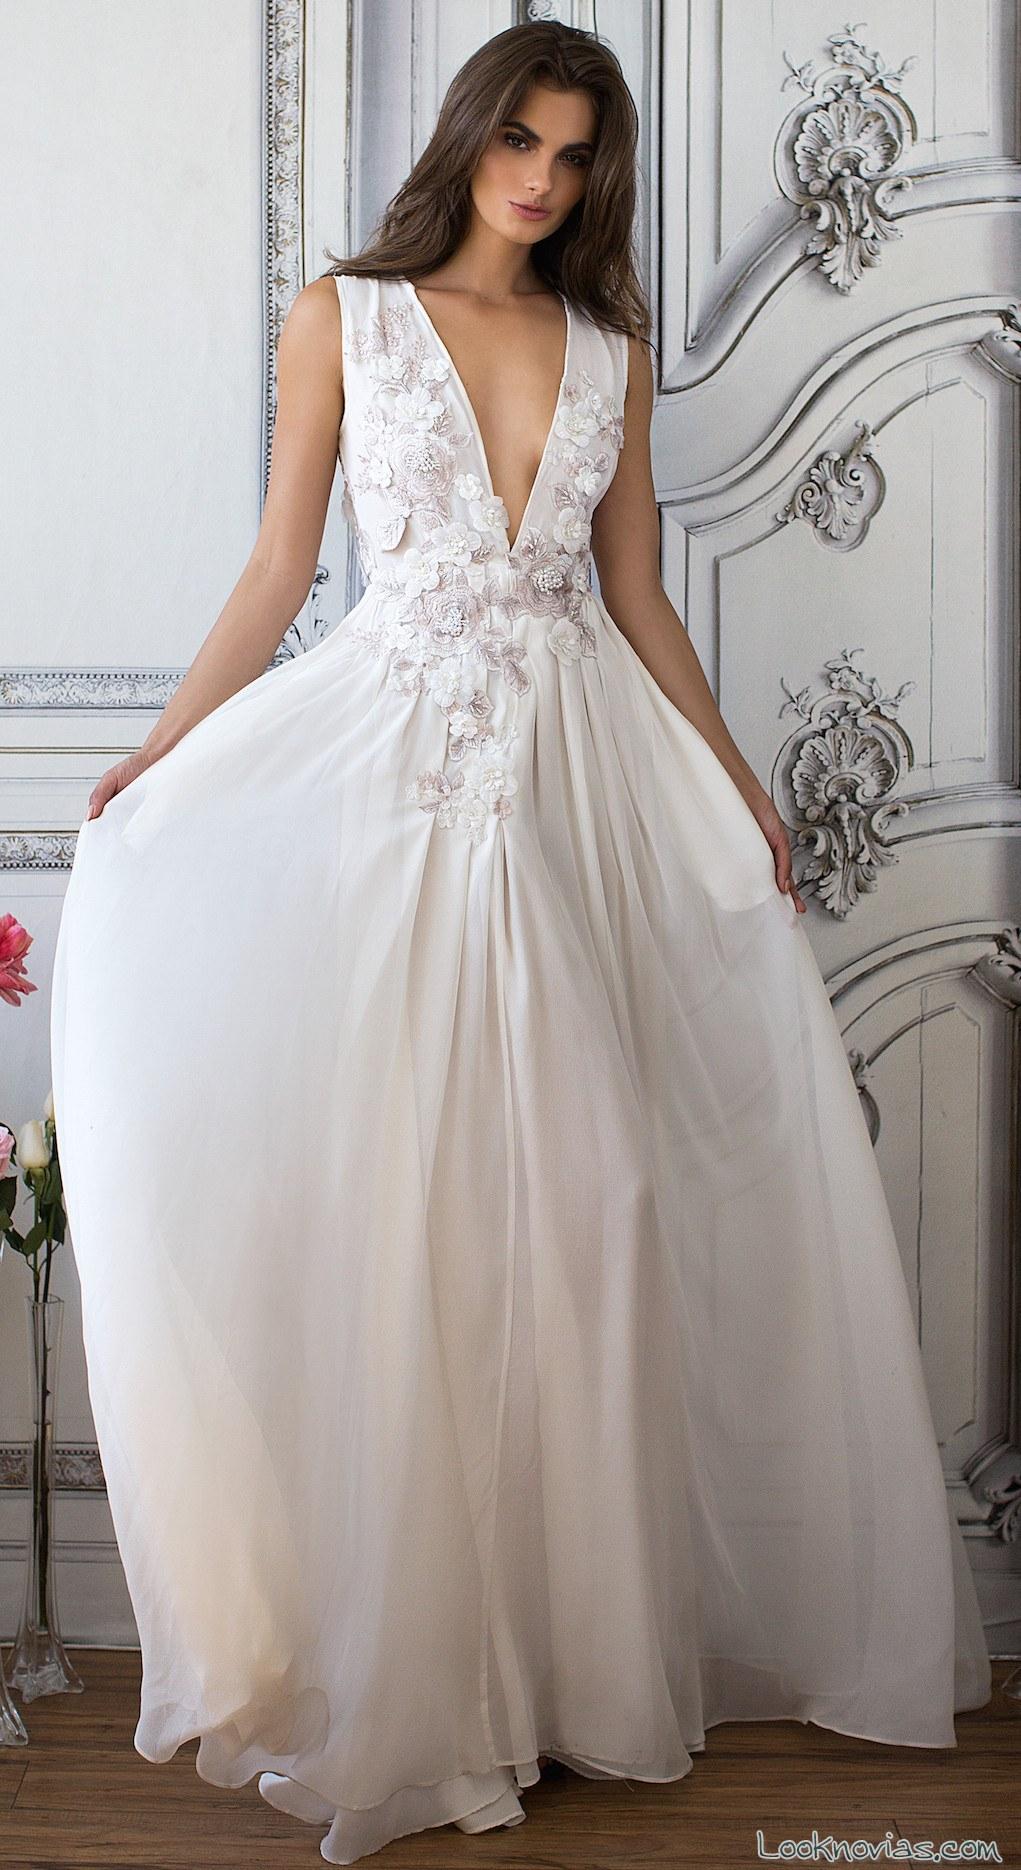 vestido novia con escote pico detalles flores